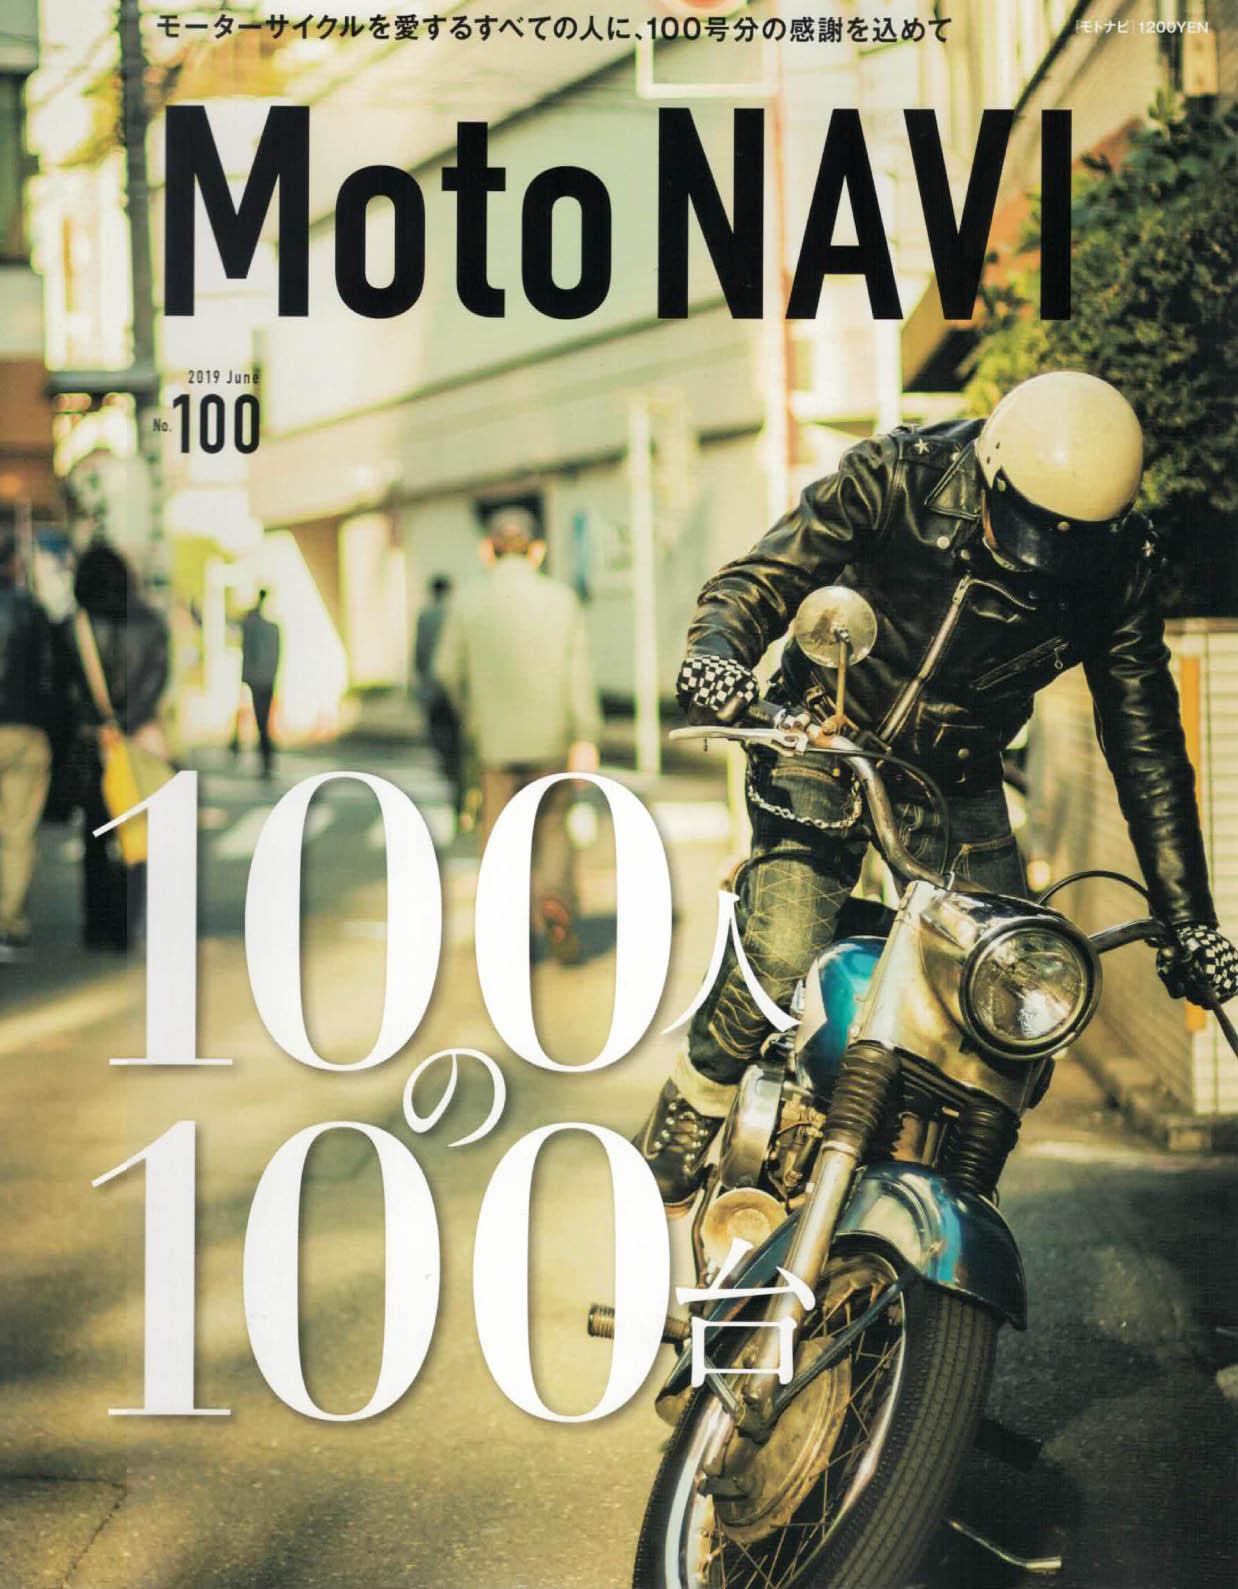 【MotoNAVI 6月号掲載】Lambretta、FANTIC CABALLERO FLAT TRACK125、CABALLERO SCRAMBLER250